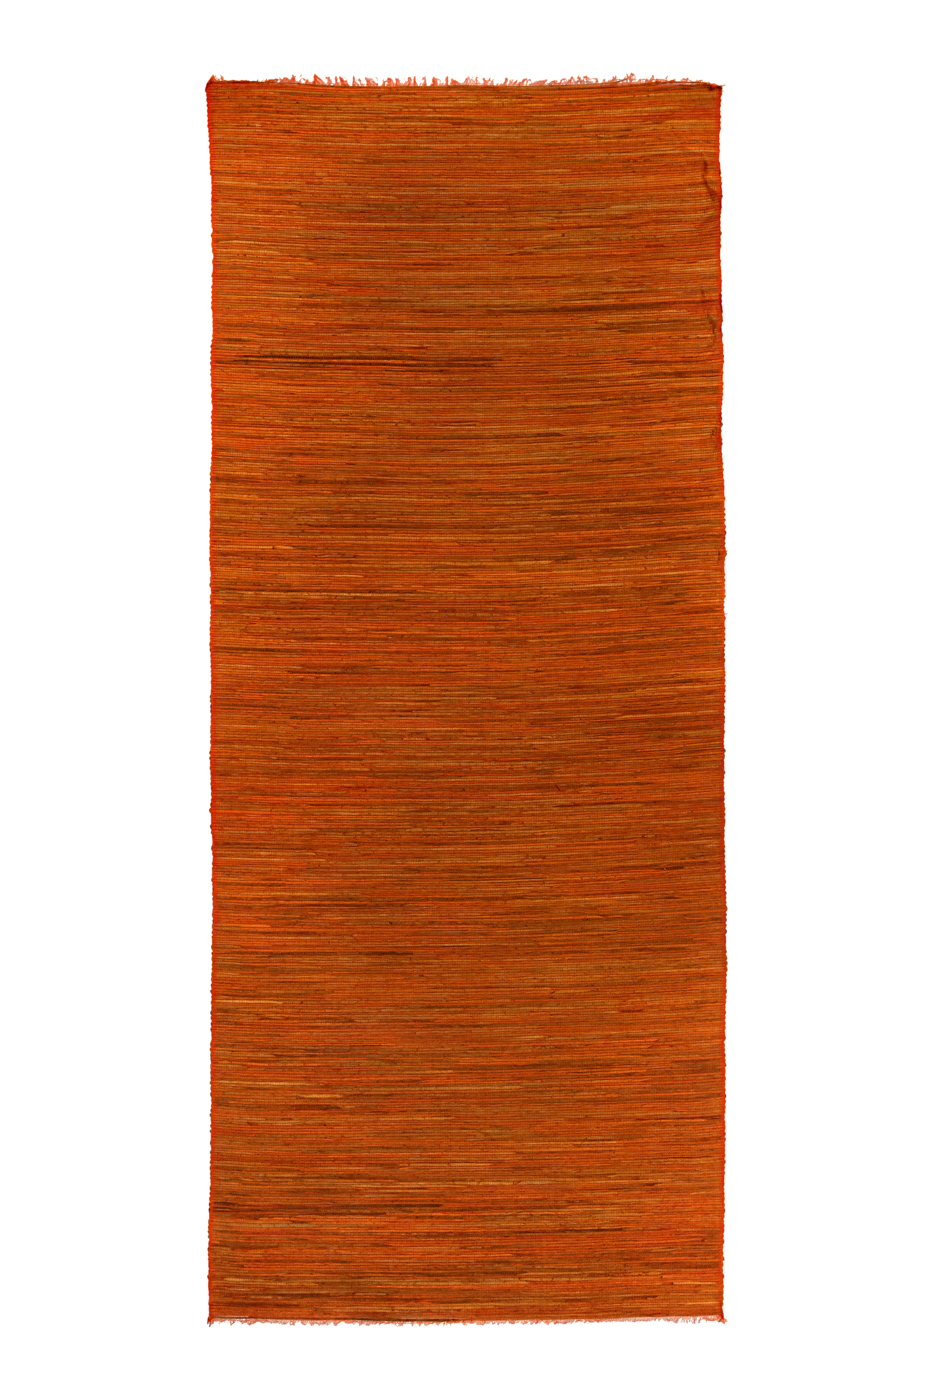 Esterilla en bamboo naranja